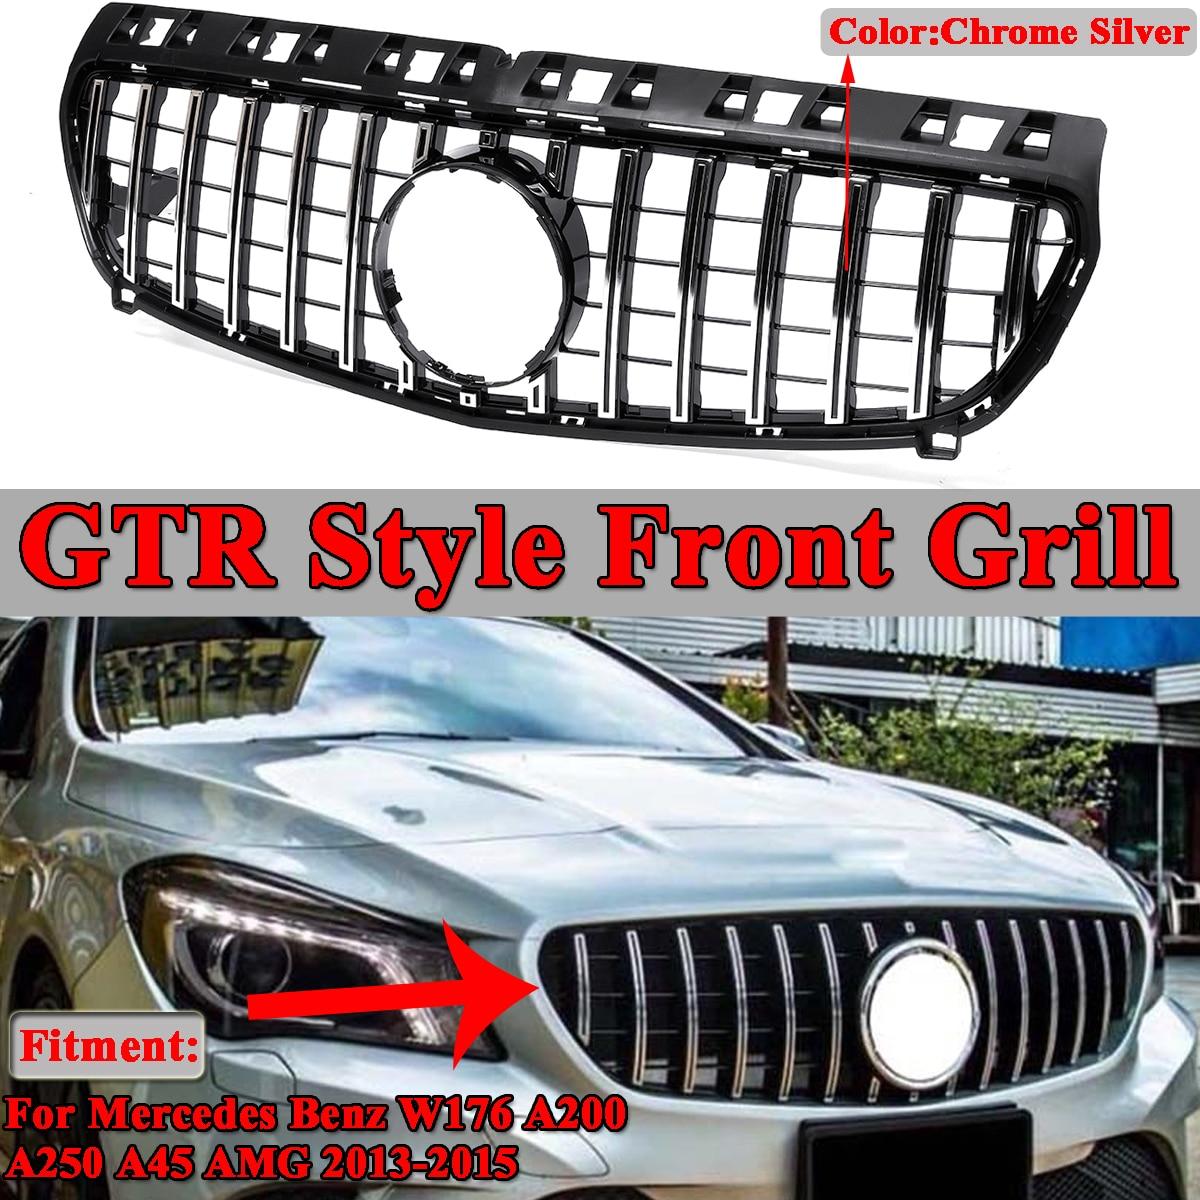 Estilo do carro GTR Racing Frente Grill Grills Para Mercedes Benz Para Facelift W176 A180 A200 A250 A45 Para AMG 2013 -2015 Sem Emblema